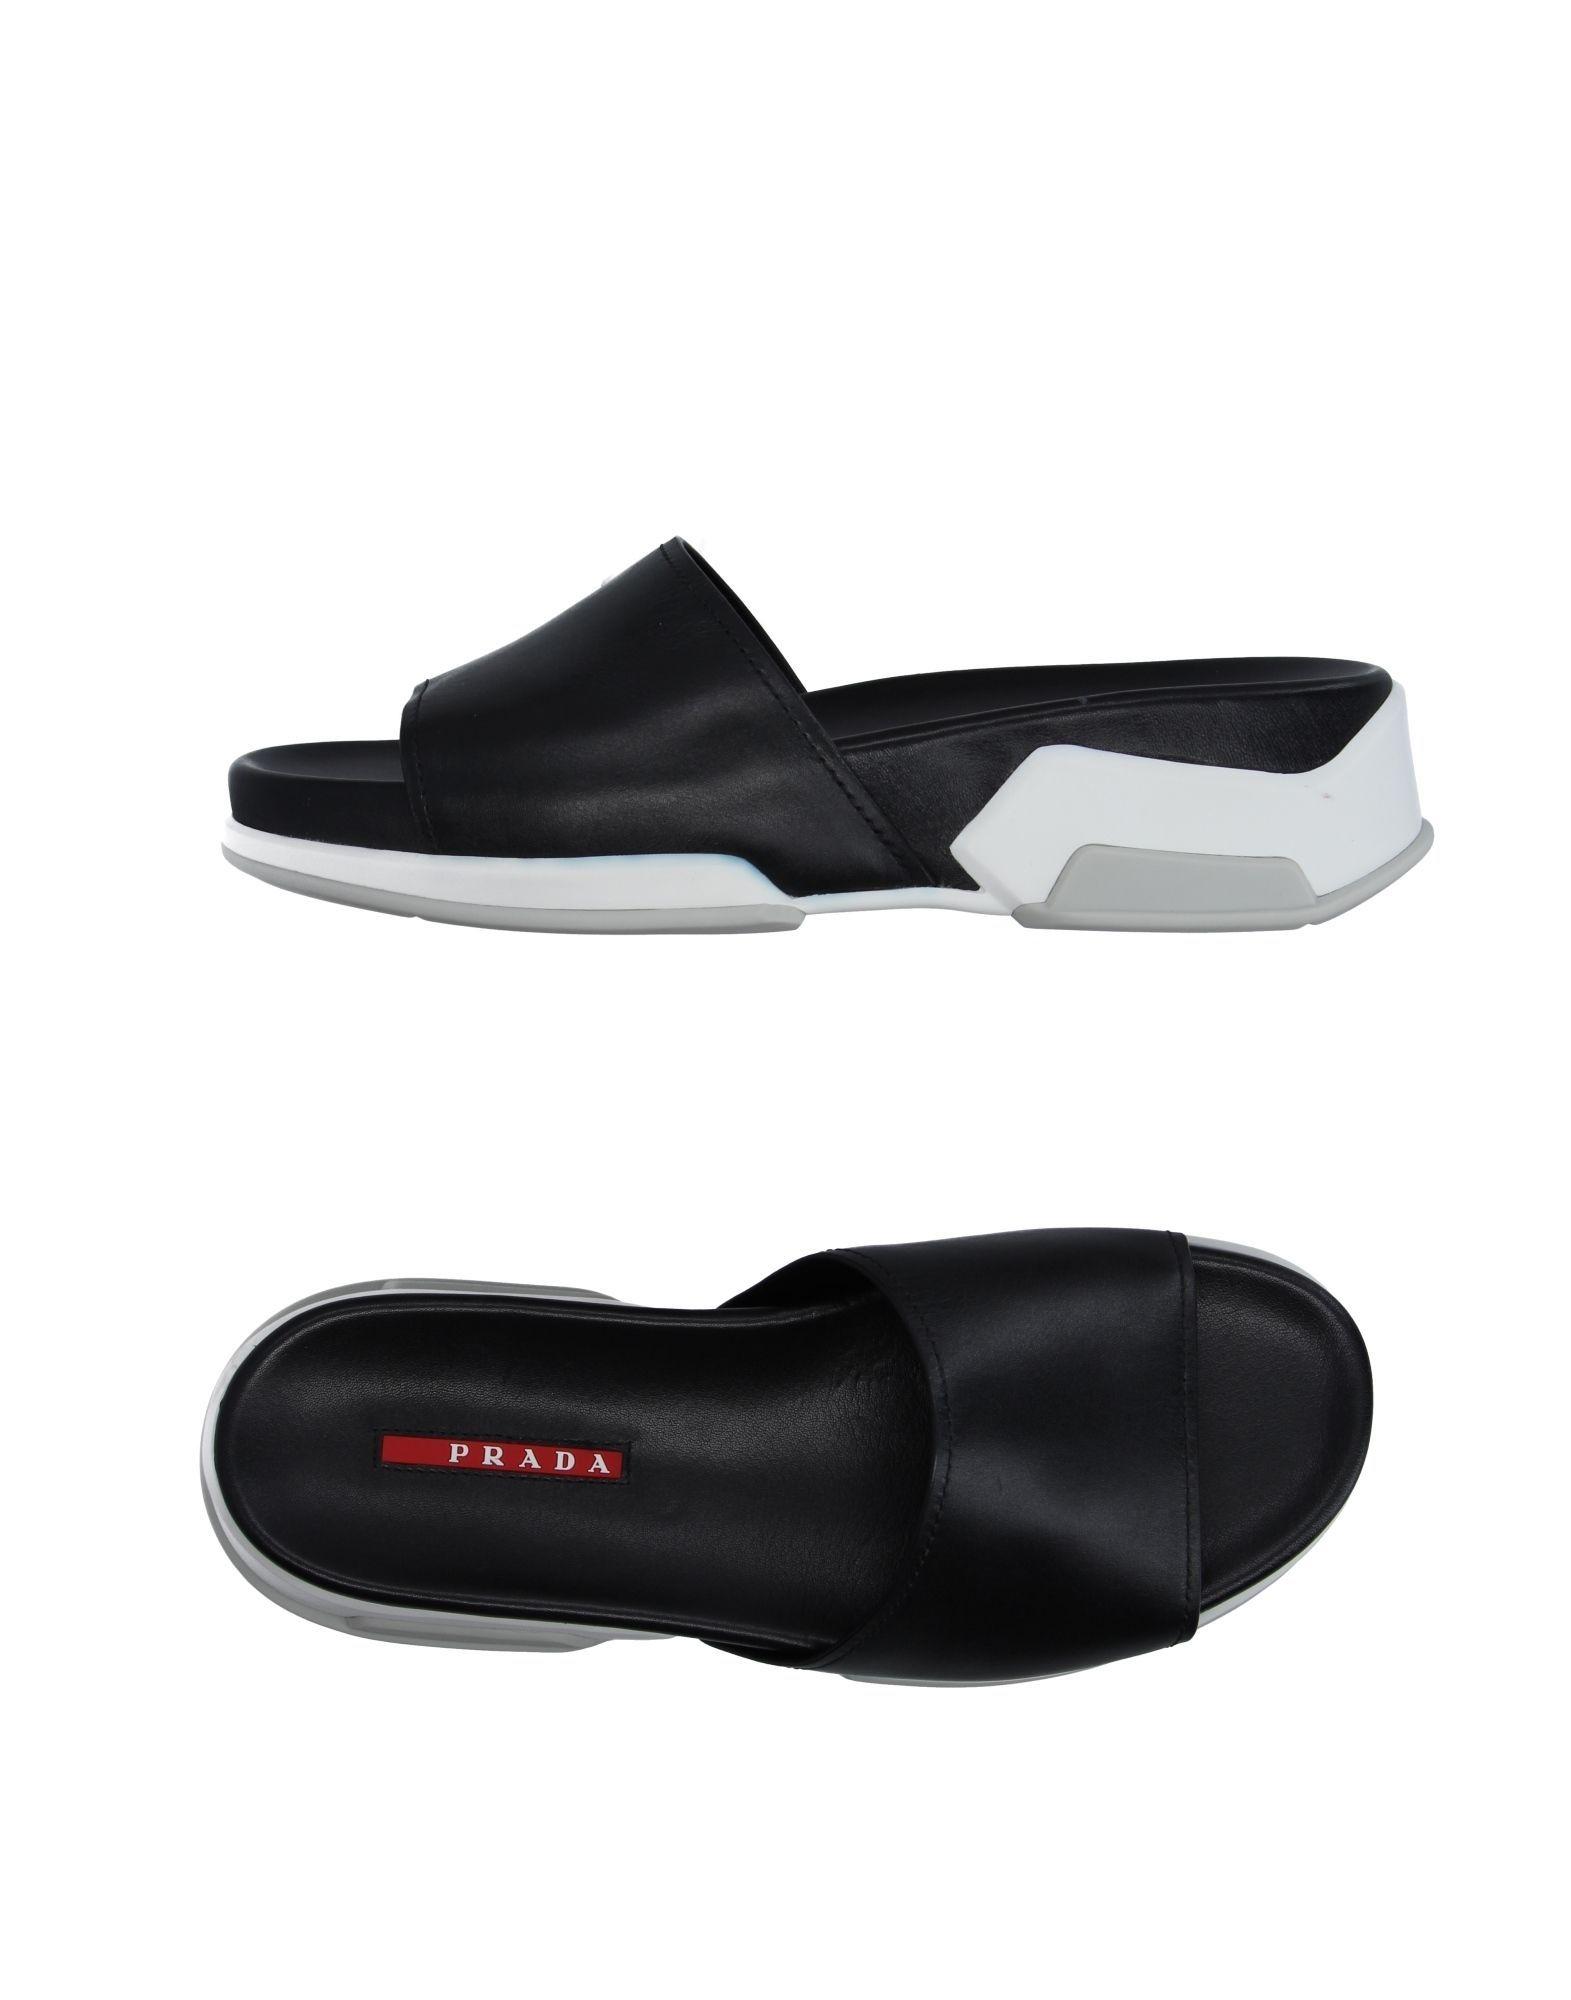 prada shoes cheapest domain host